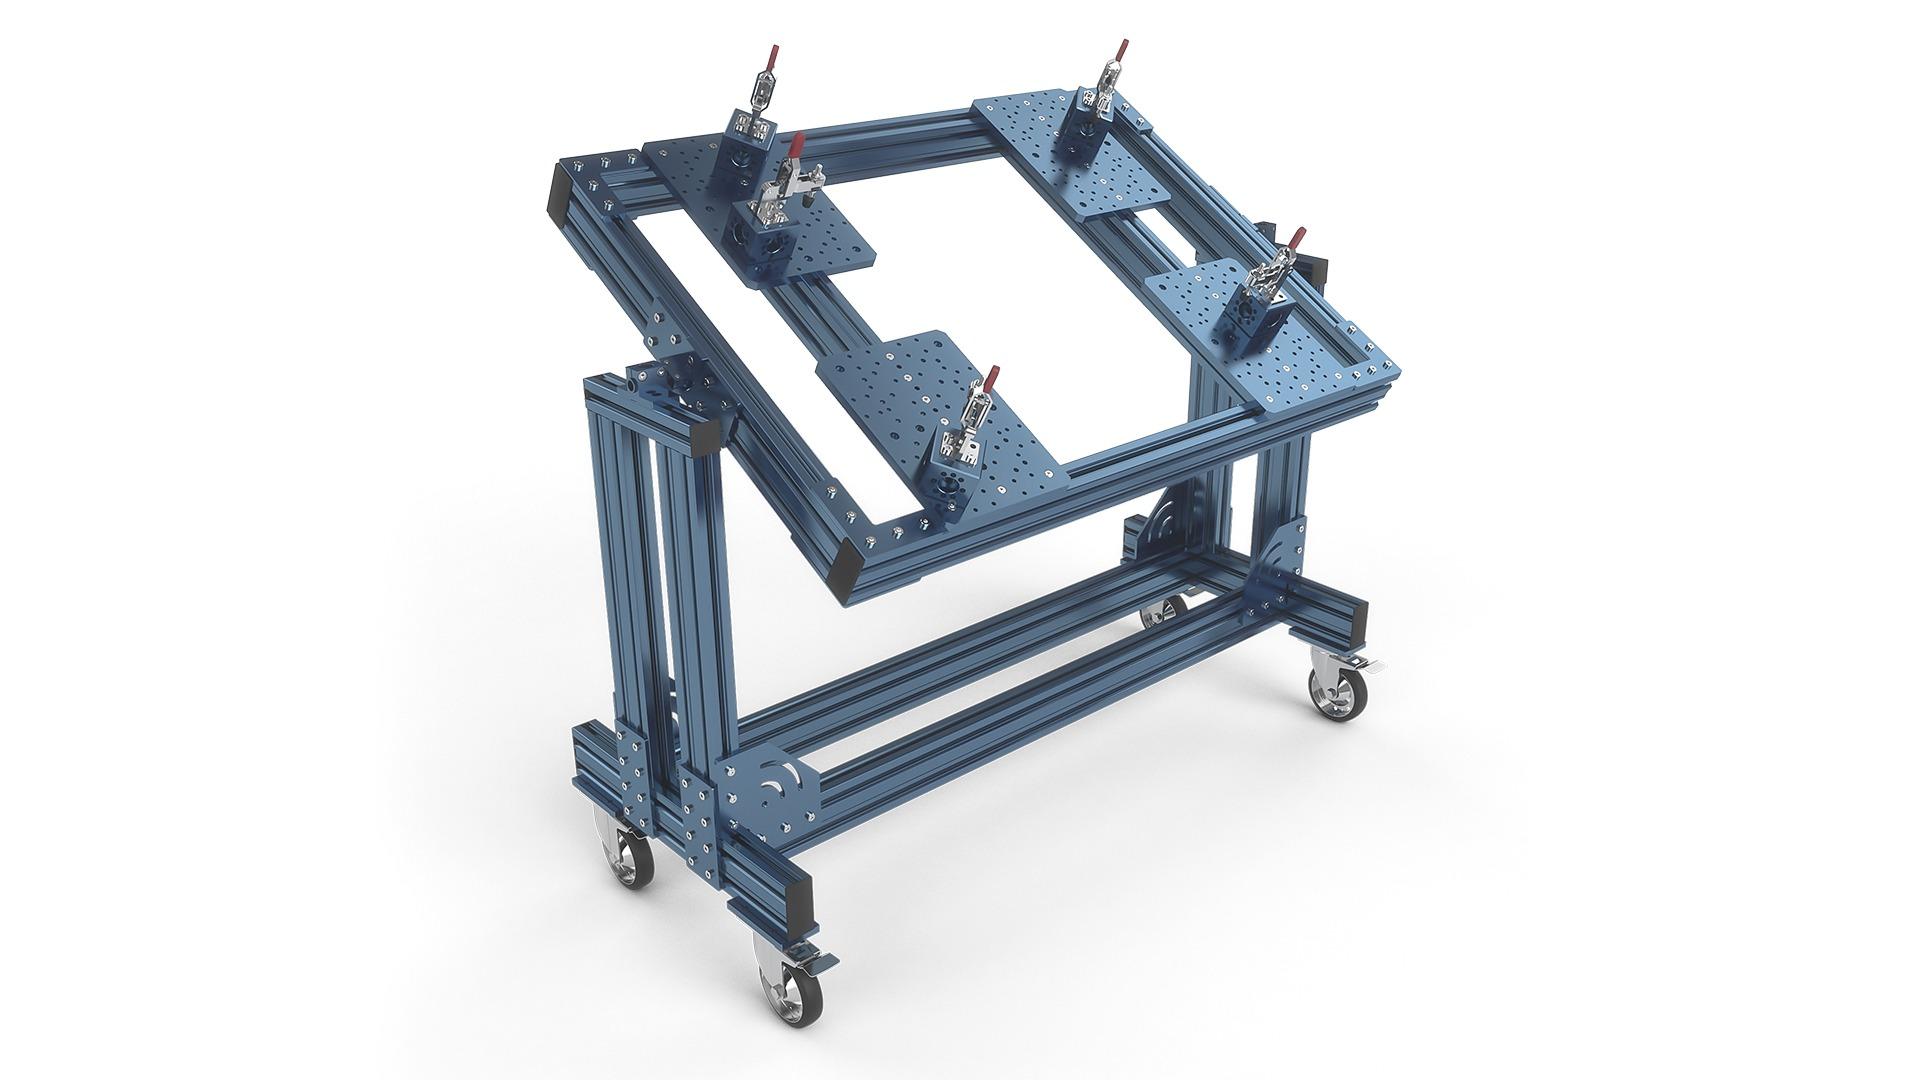 Is A Web Based Machine Builder Platform